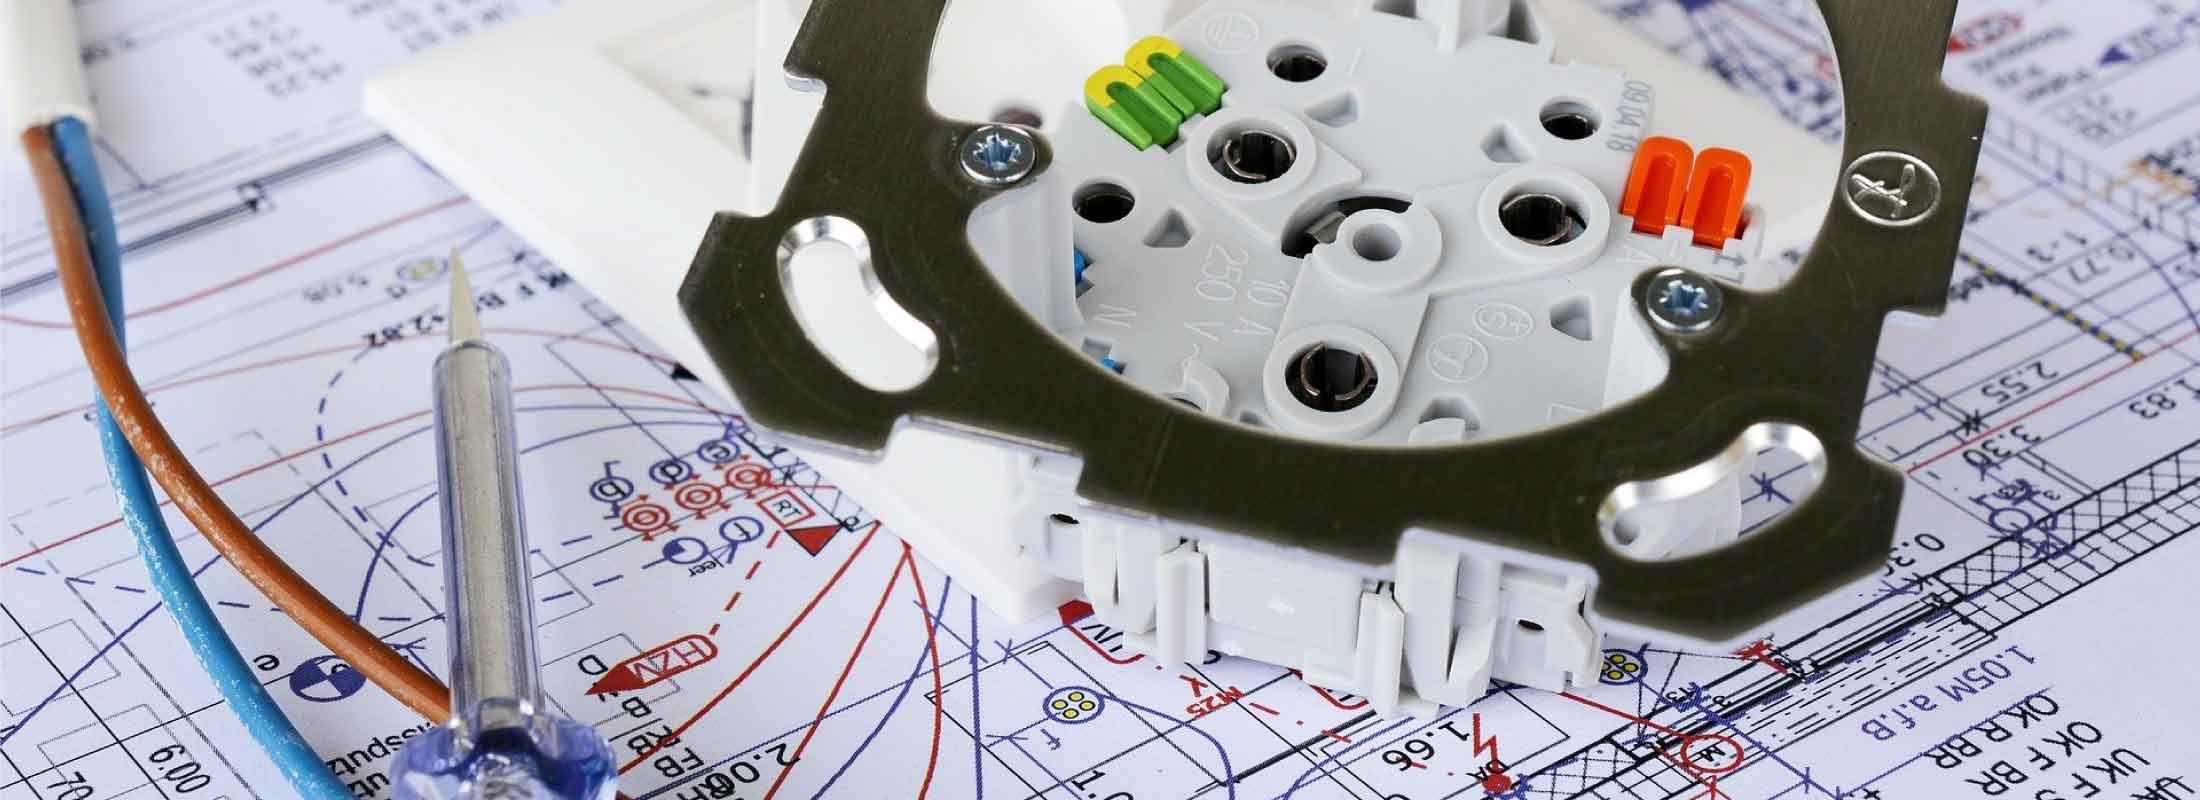 Elektroinstallation Fachunternehmen